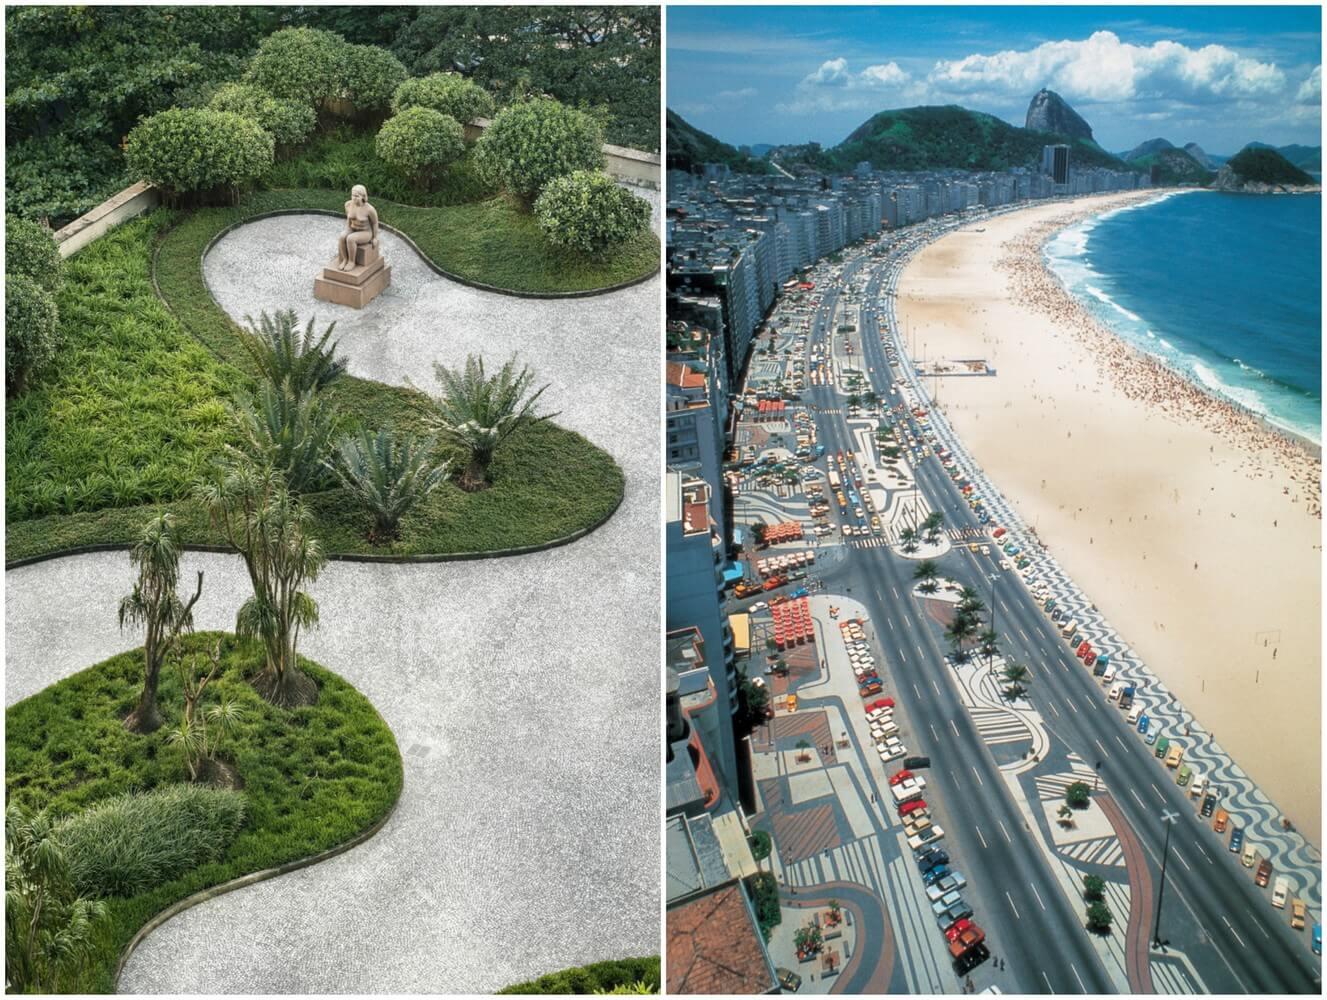 2_Roberto Burle Marx, Copacabana Beach and the Ministry of Health & Education building, Rio De Janiro